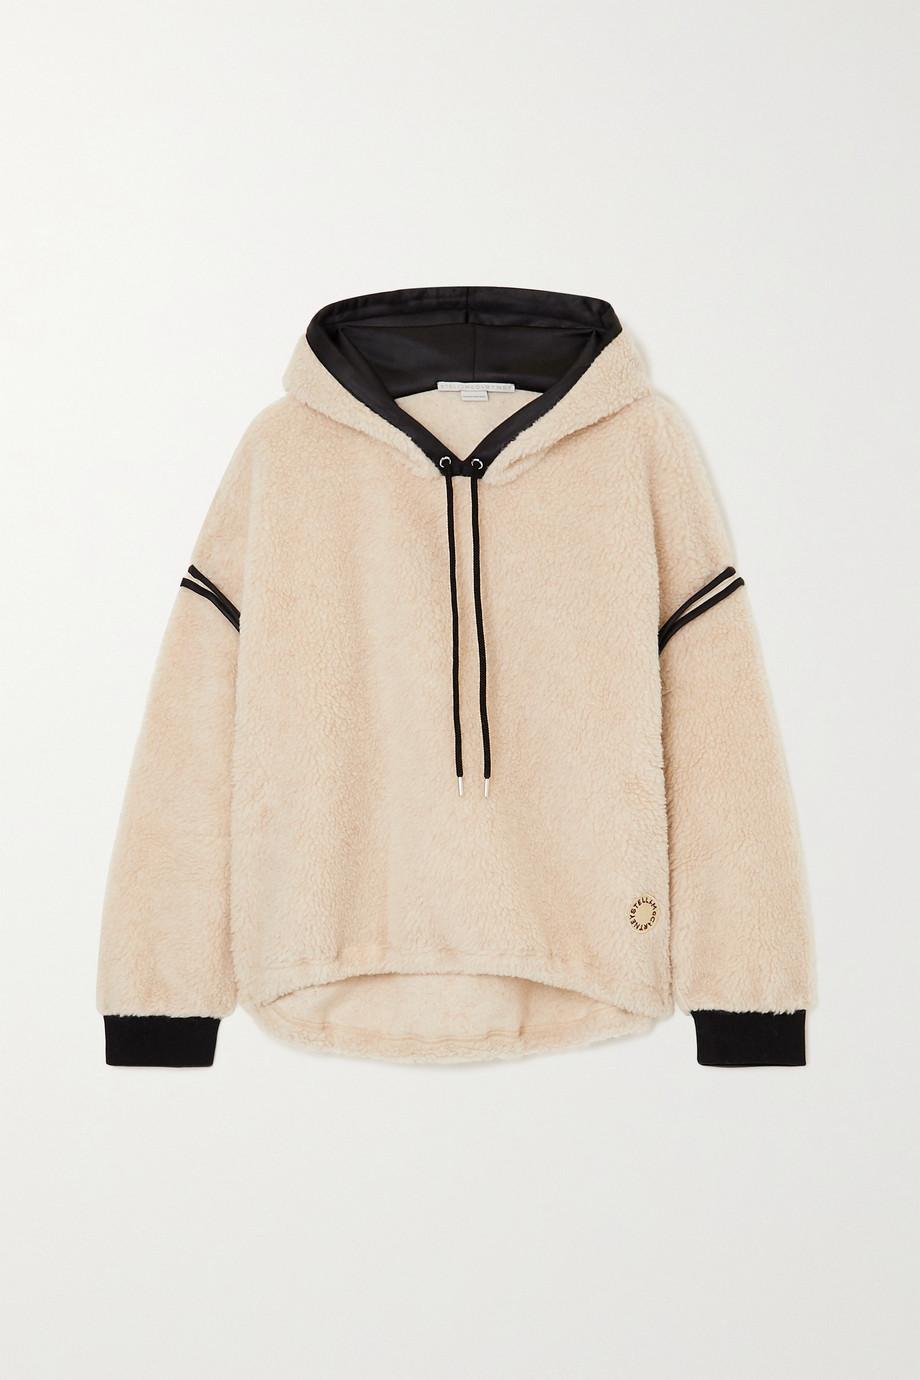 Stella McCartney Faux shearling hoodie